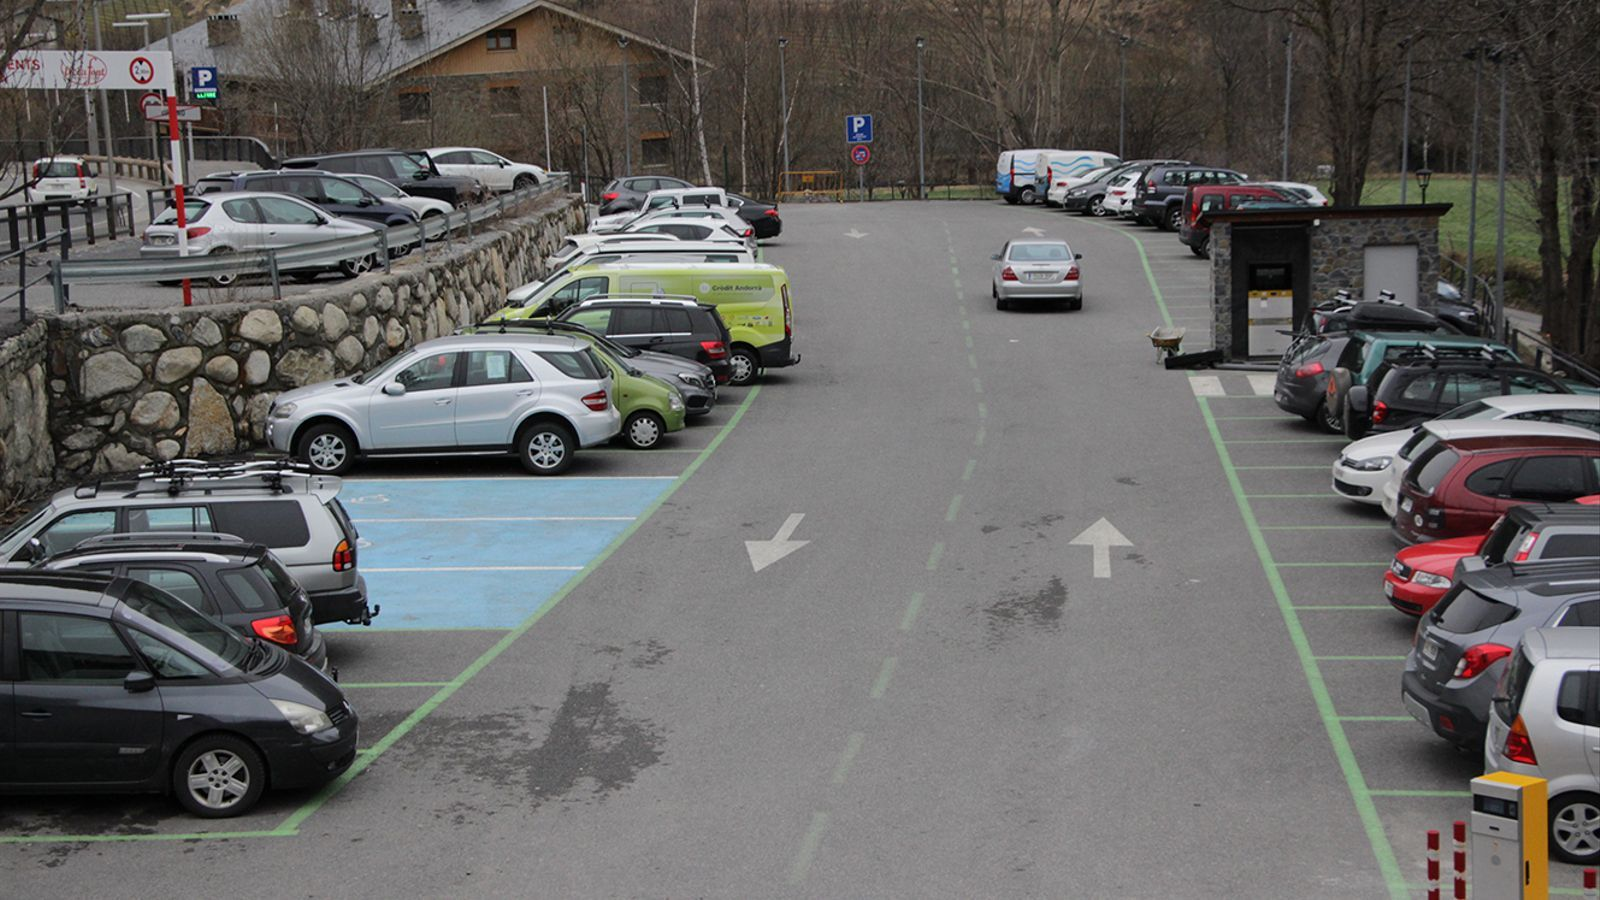 L'aparcament de Prat Vilella, a Ordino. / Comú d'Ordino